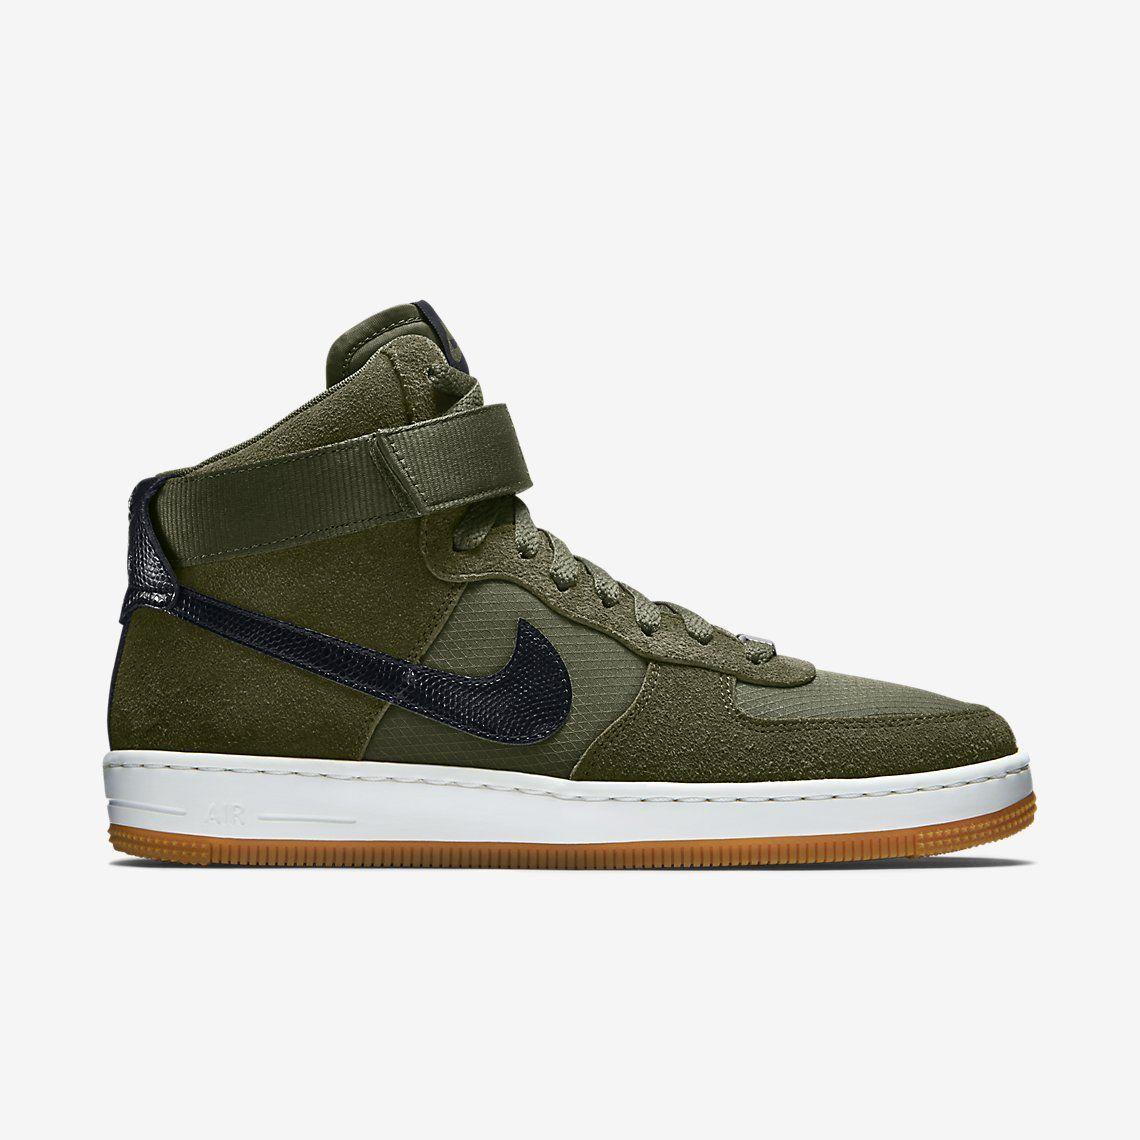 officiel de vente sortie grand escompte Nike Blazer Mi Ab Vntg Ser vente authentique escompte bonne vente SDhuvWqc6